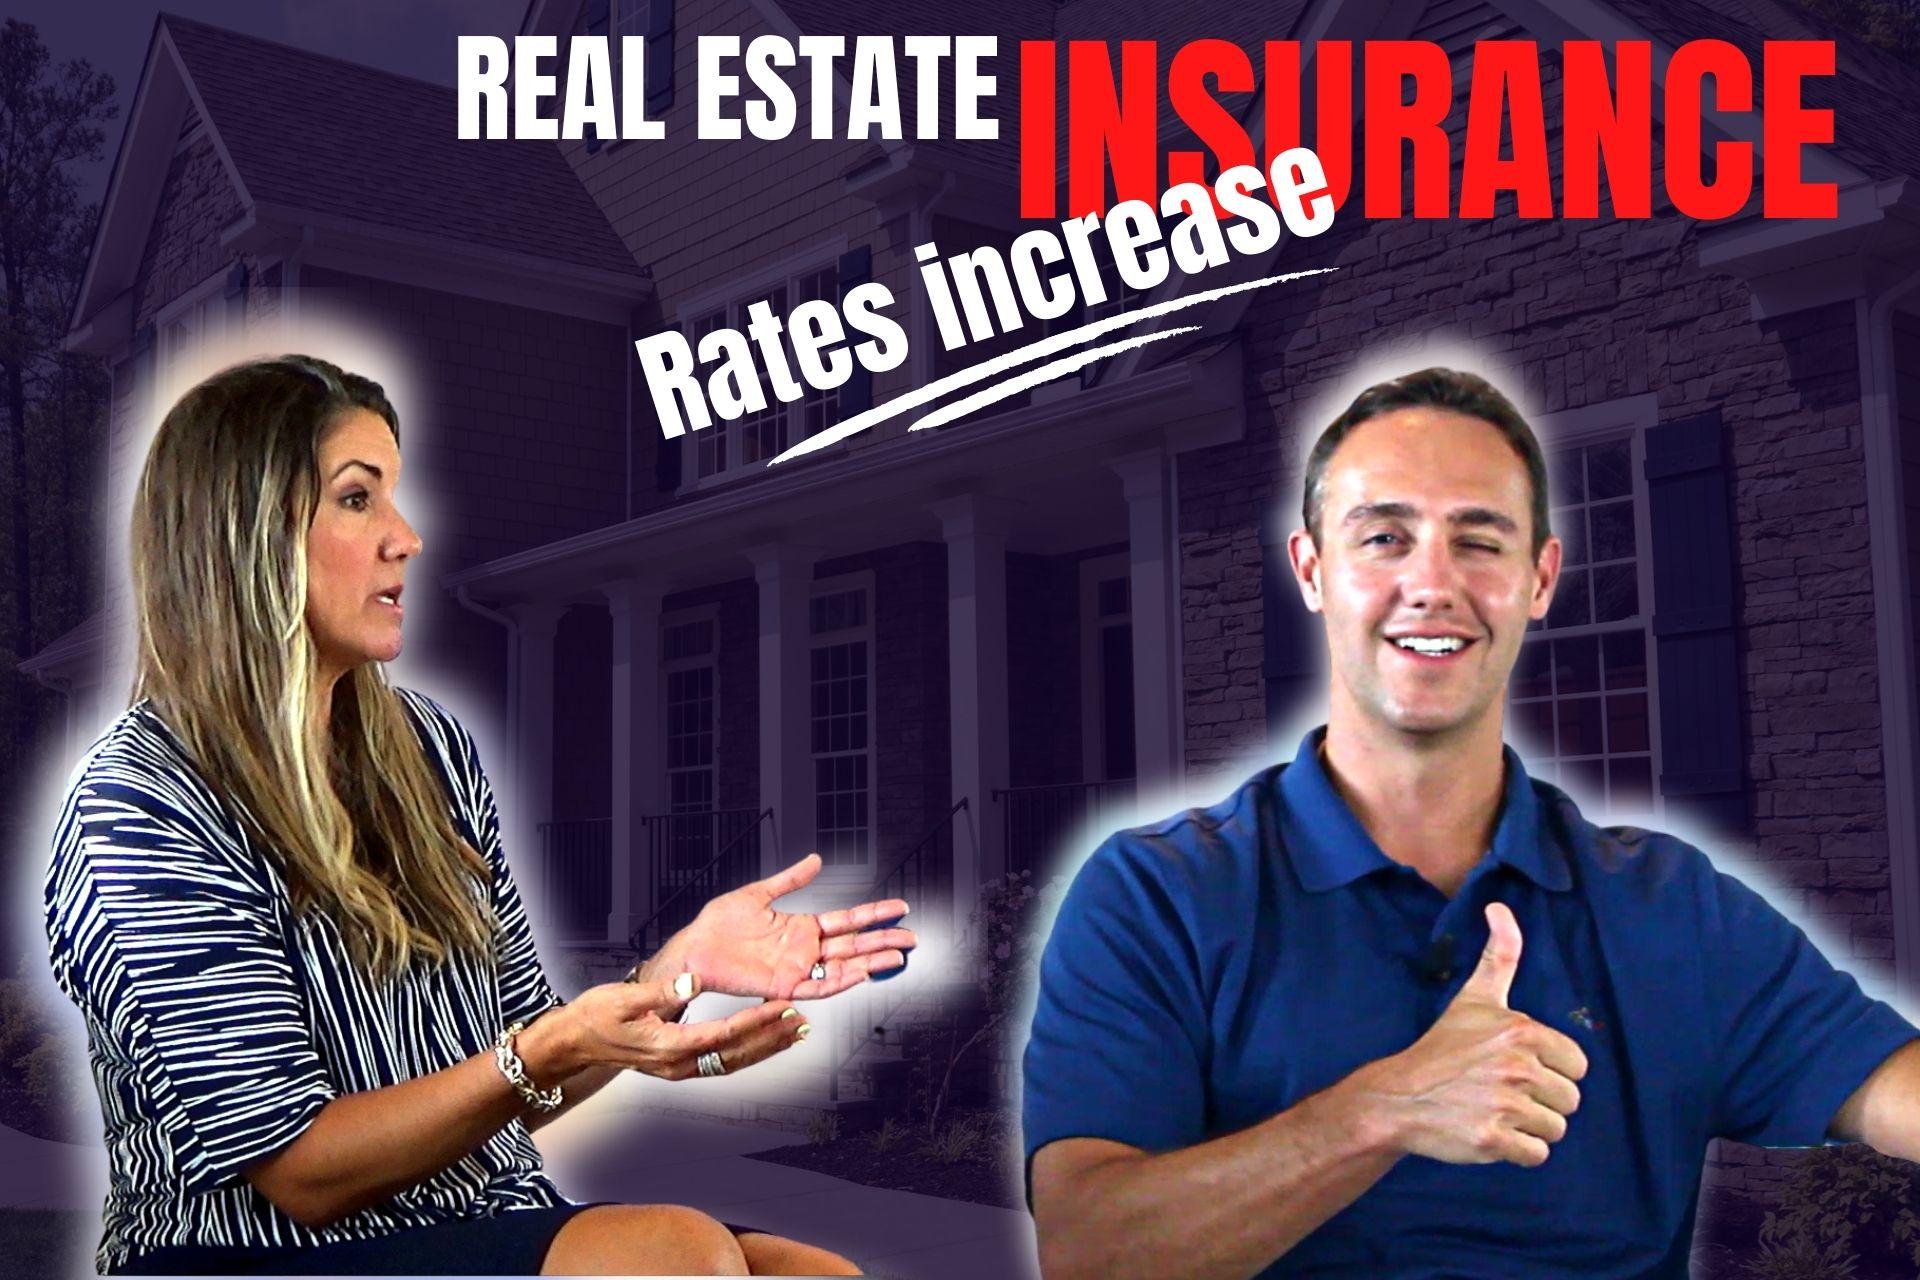 Interview with insurance Specialist Kara Herring - Insurance Premium Increase